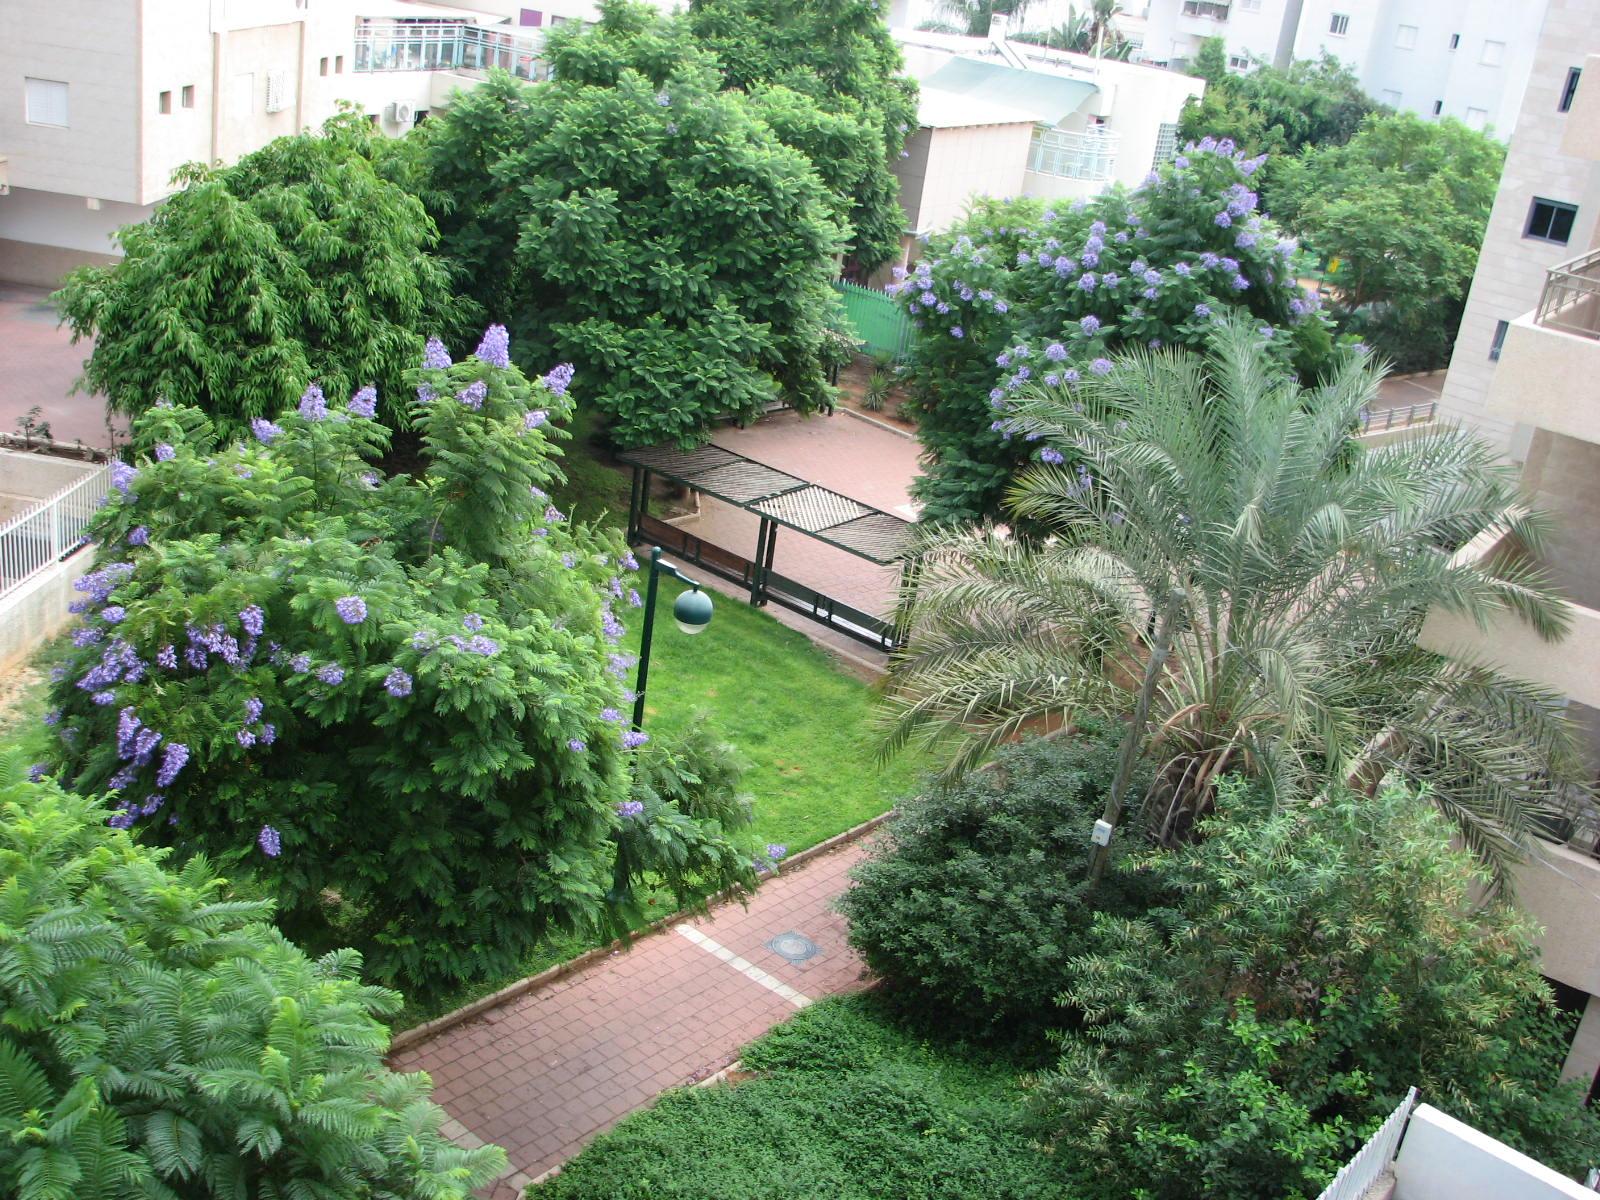 Файл:Garden in Ramat Gan.jpg